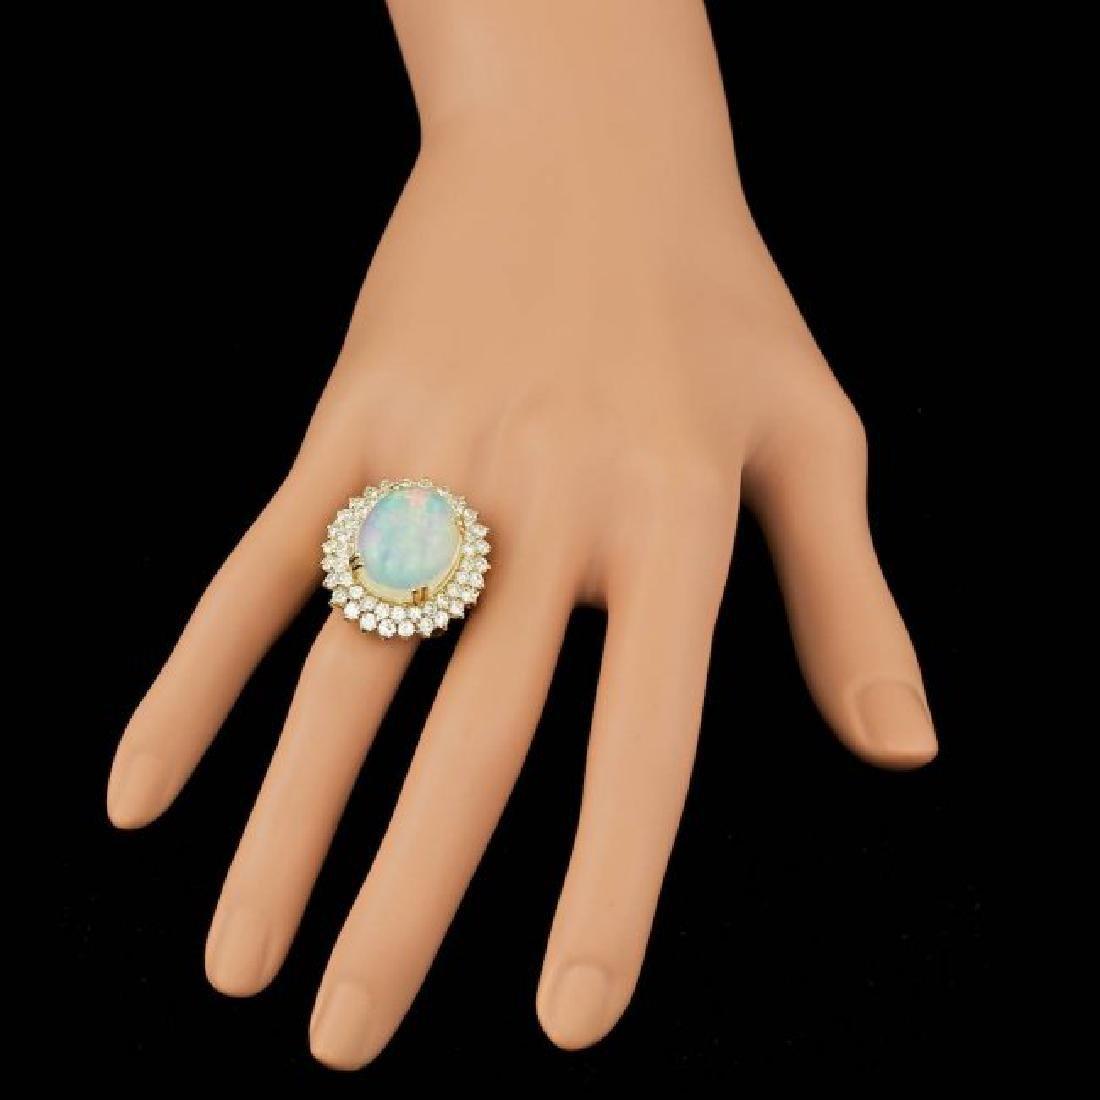 14k Yellow Gold 9.00ct Opal 3.15ct Diamond Ring - 4